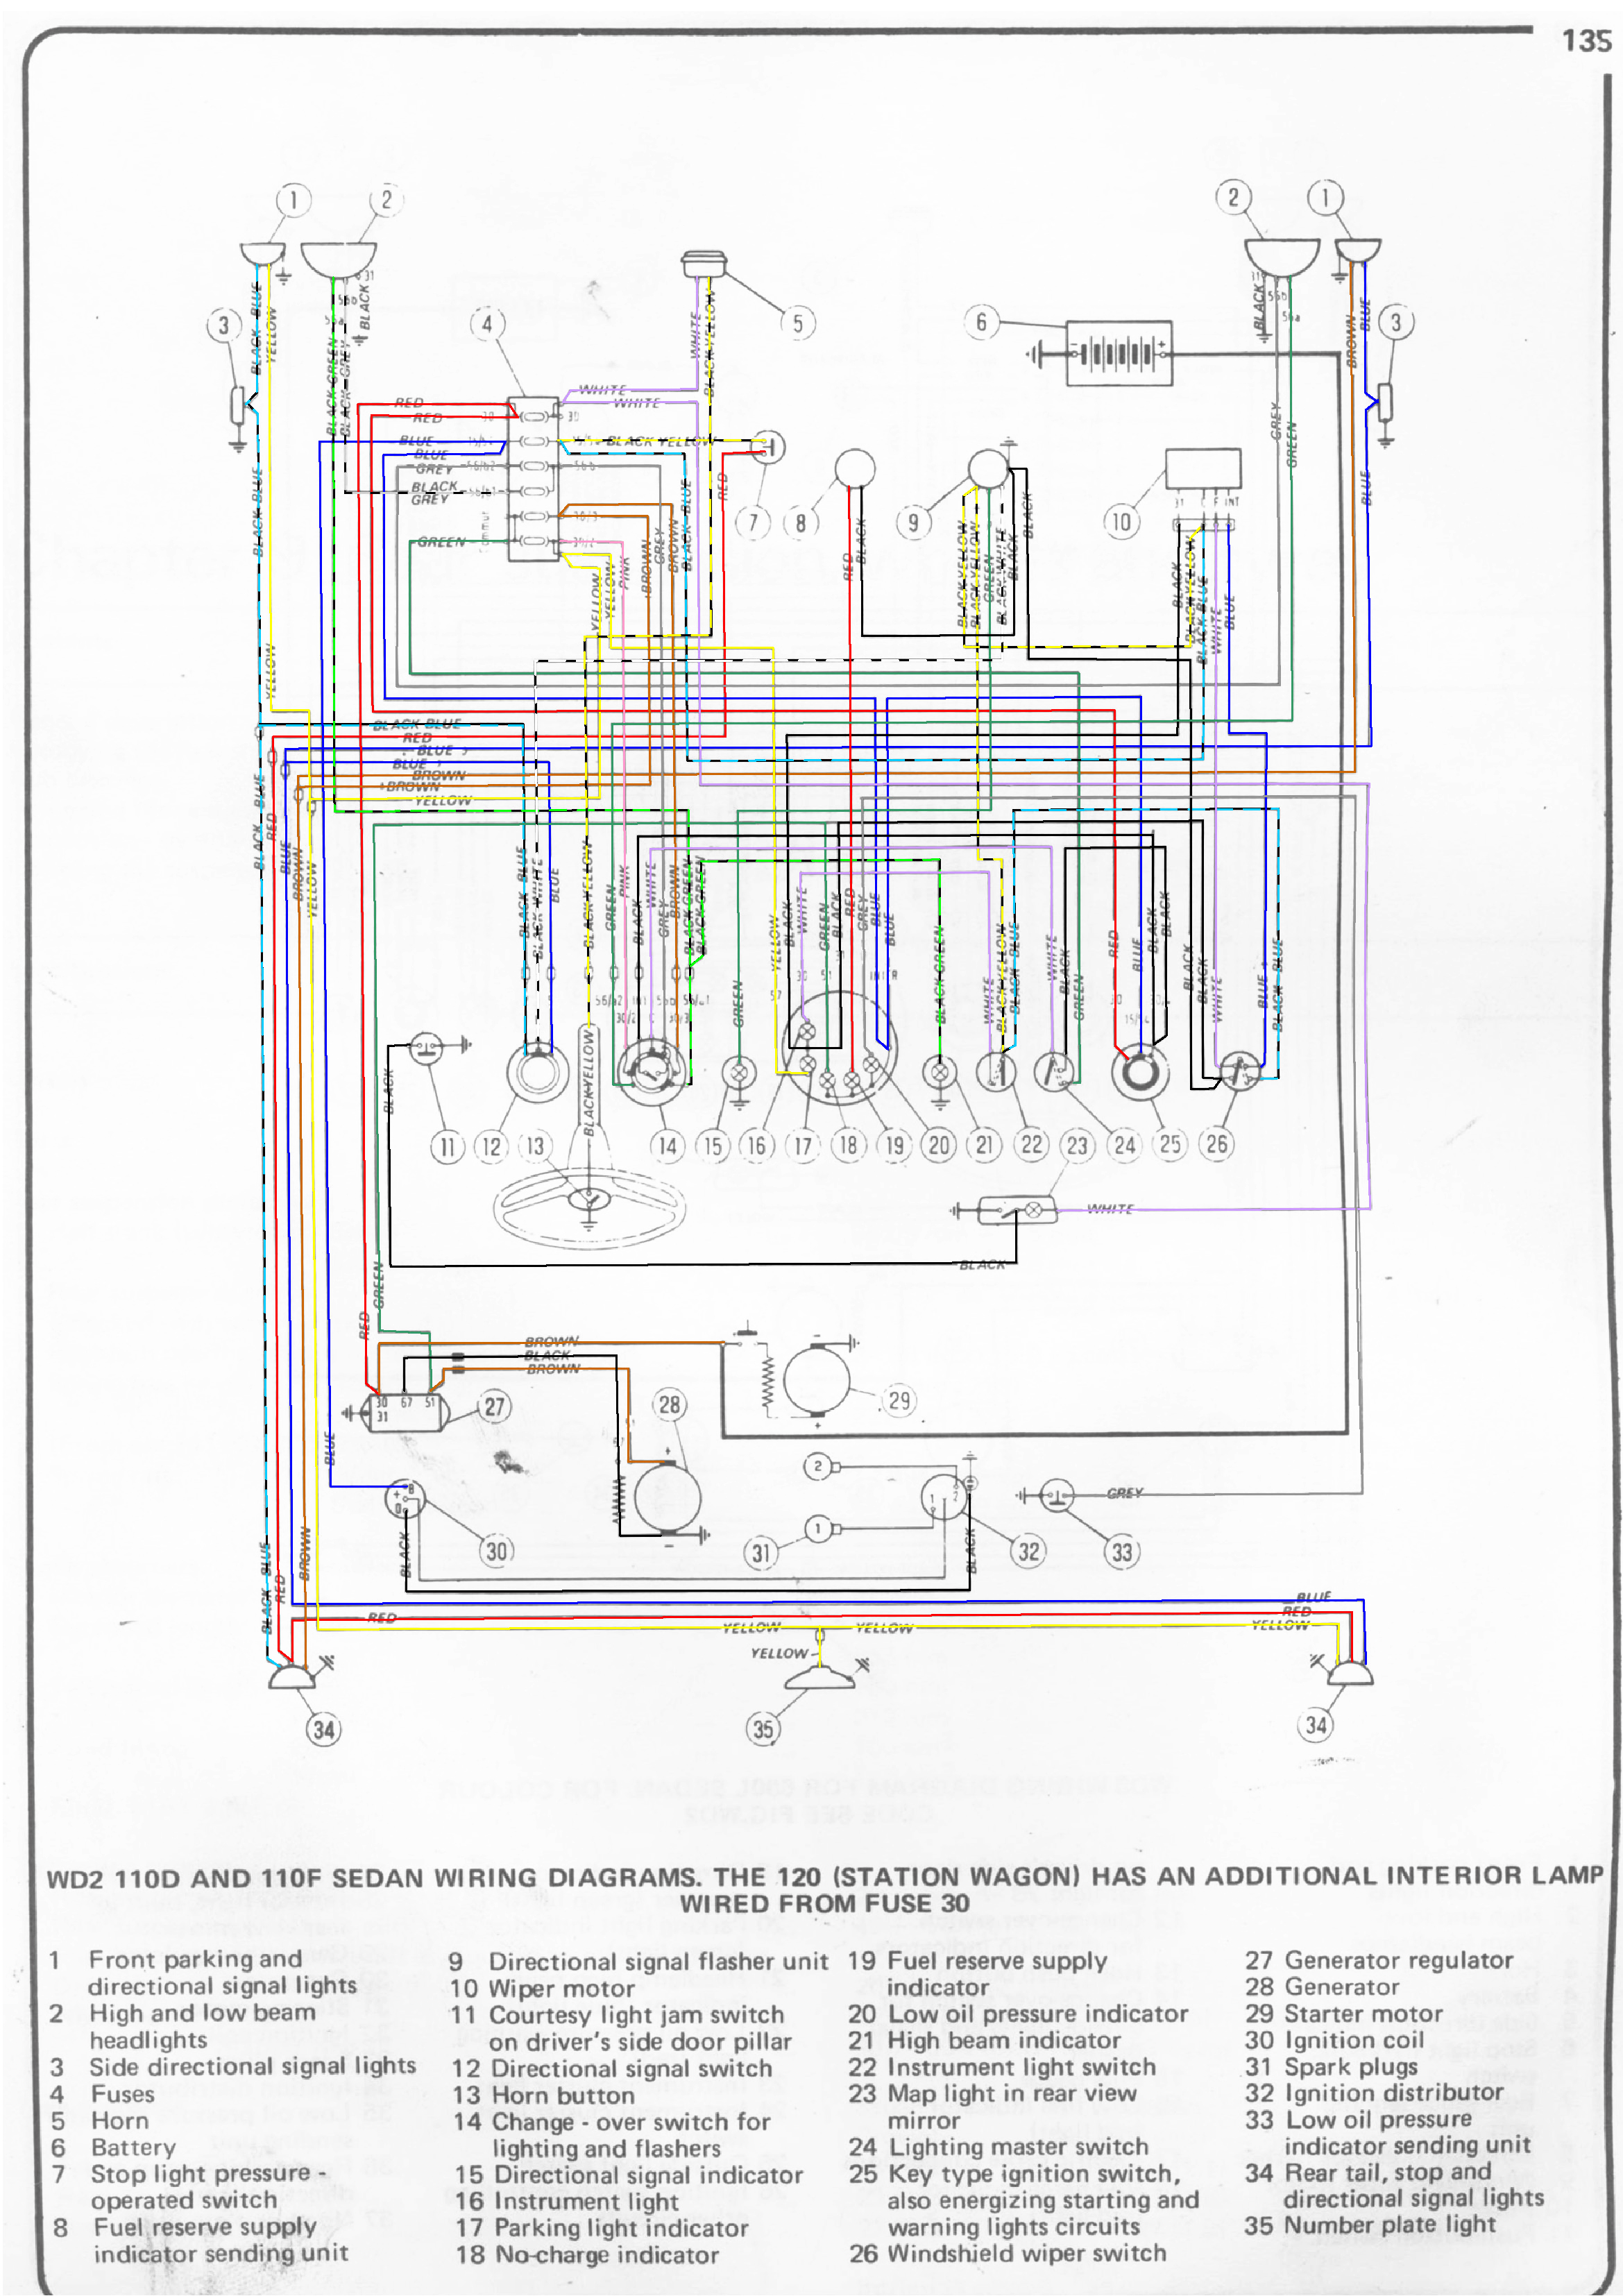 small resolution of wiring diagram fiat stilo 1 9 jtd wiring diagram view fiat wiring diagrams blog wiring diagram